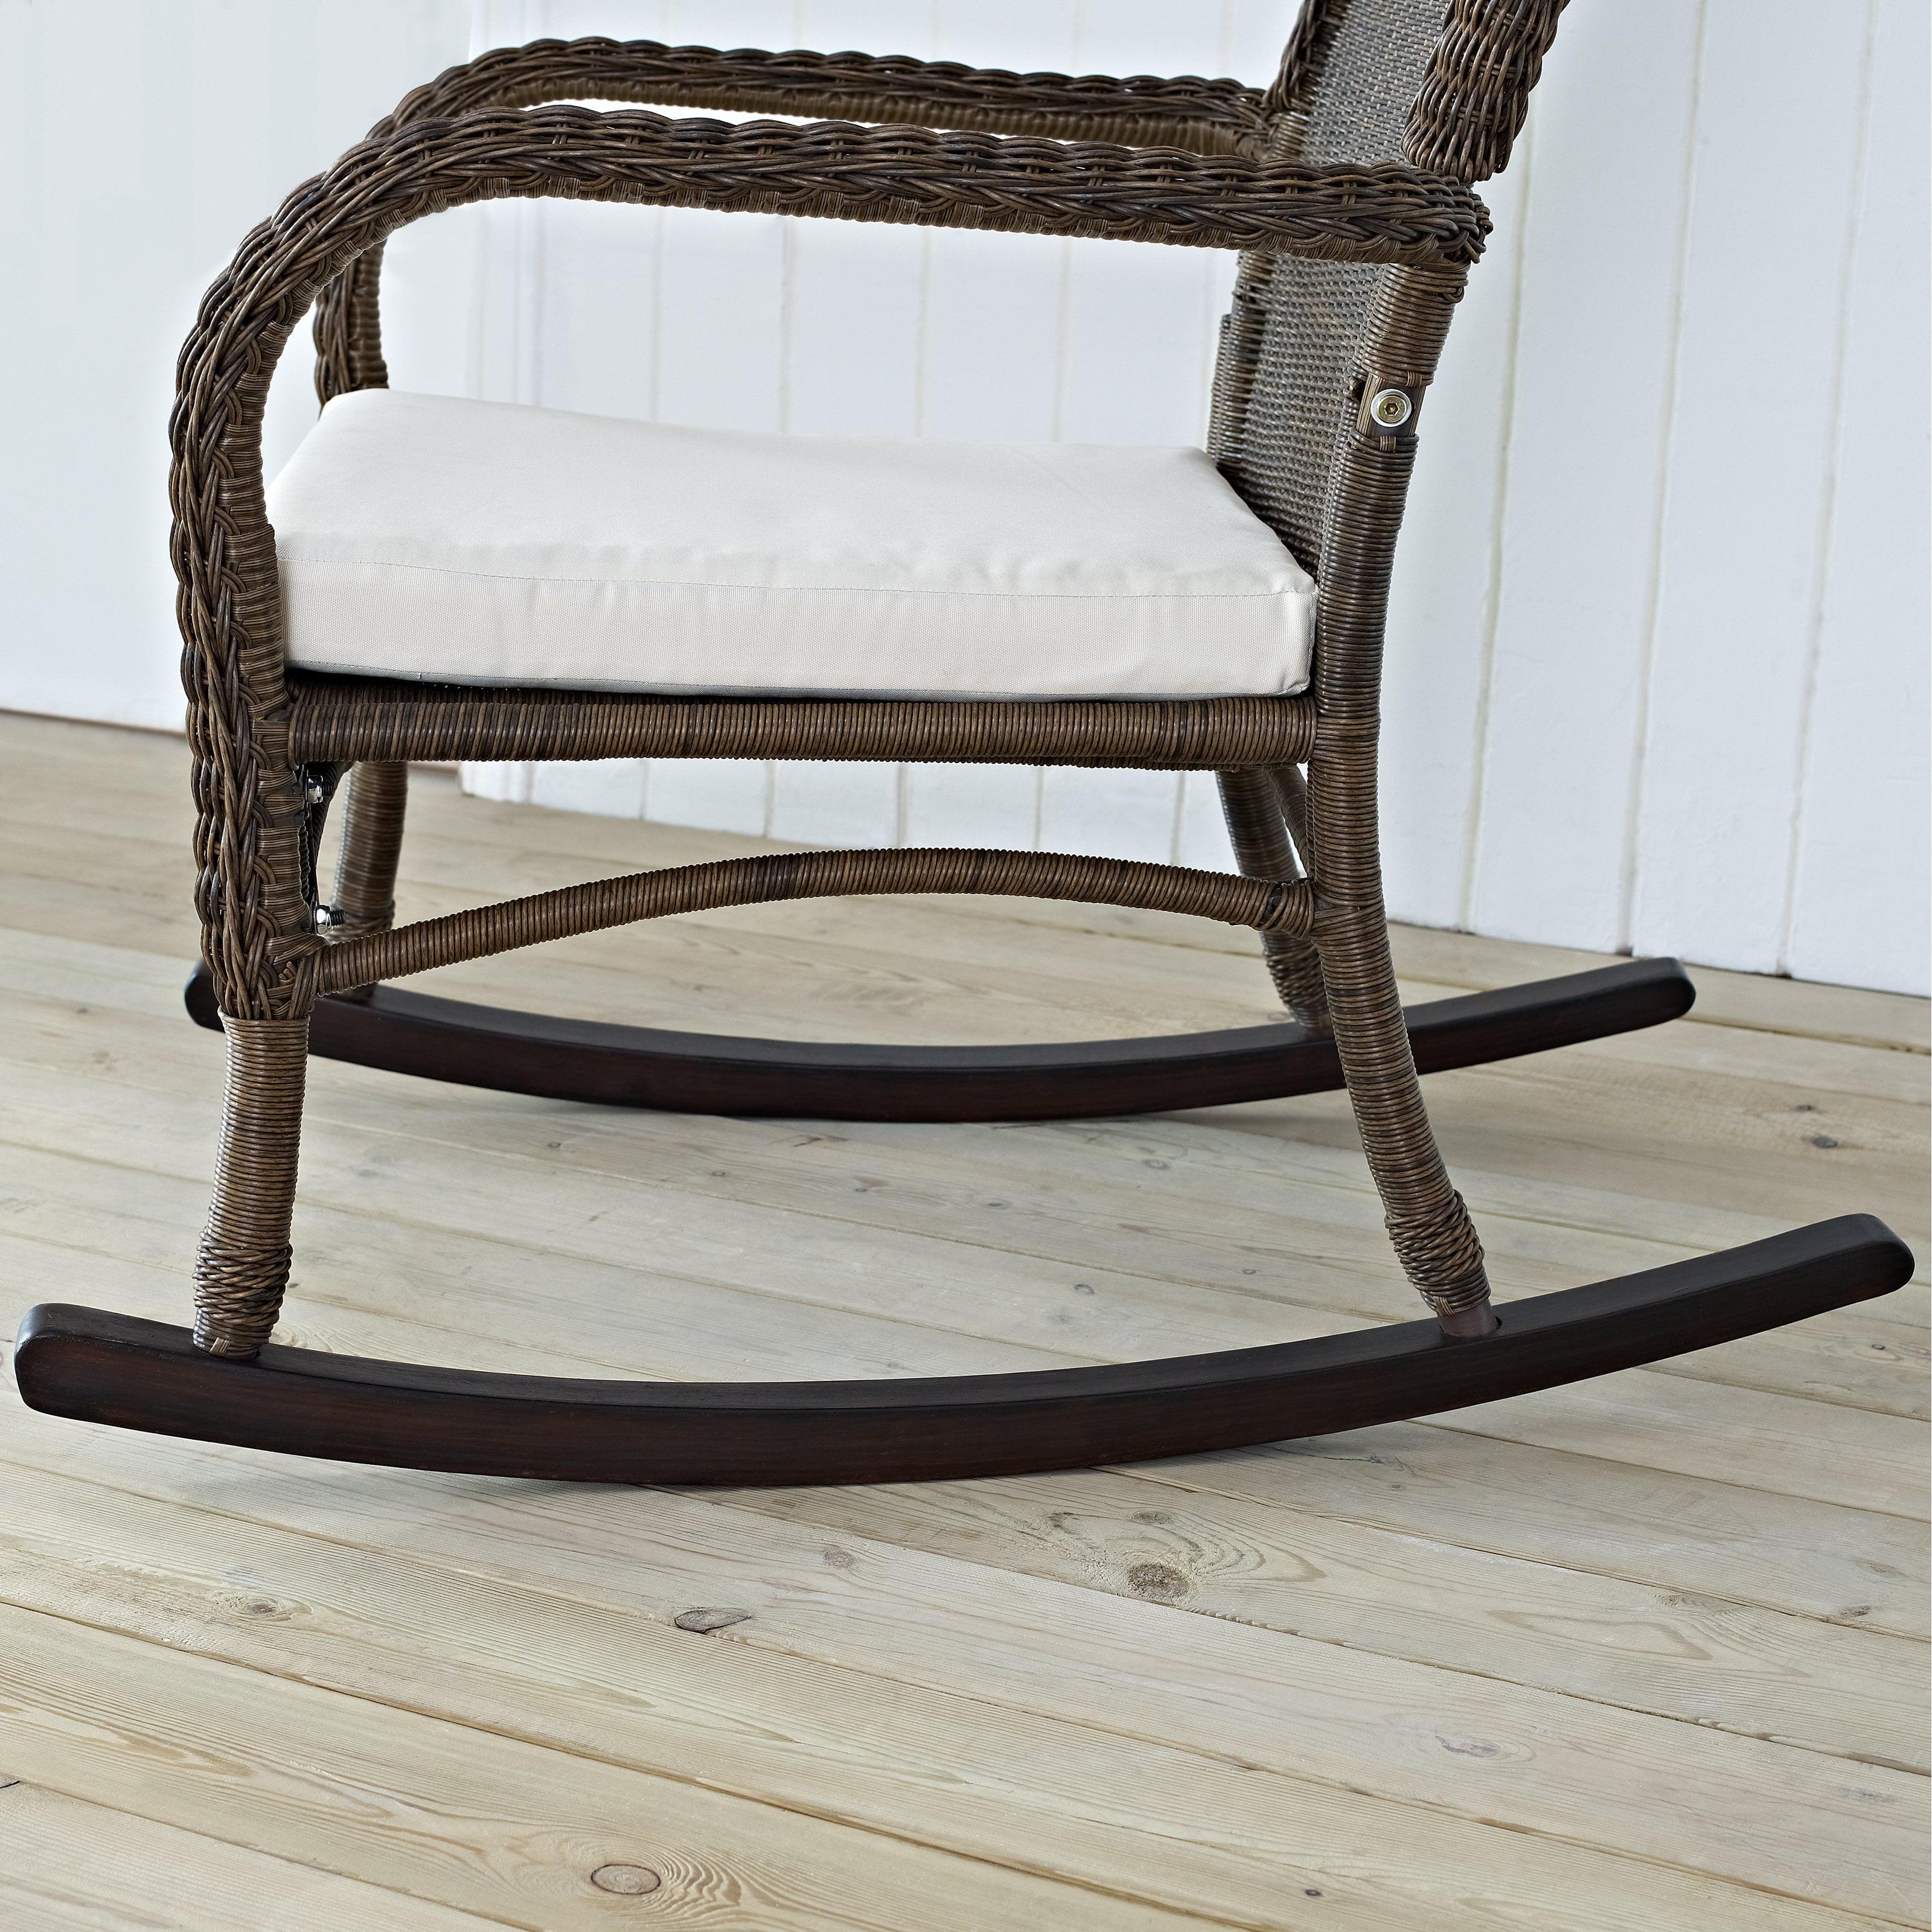 coral coast mocha resin wicker rocking chair with beige cushion walmartcom - Wicker Rocking Chair